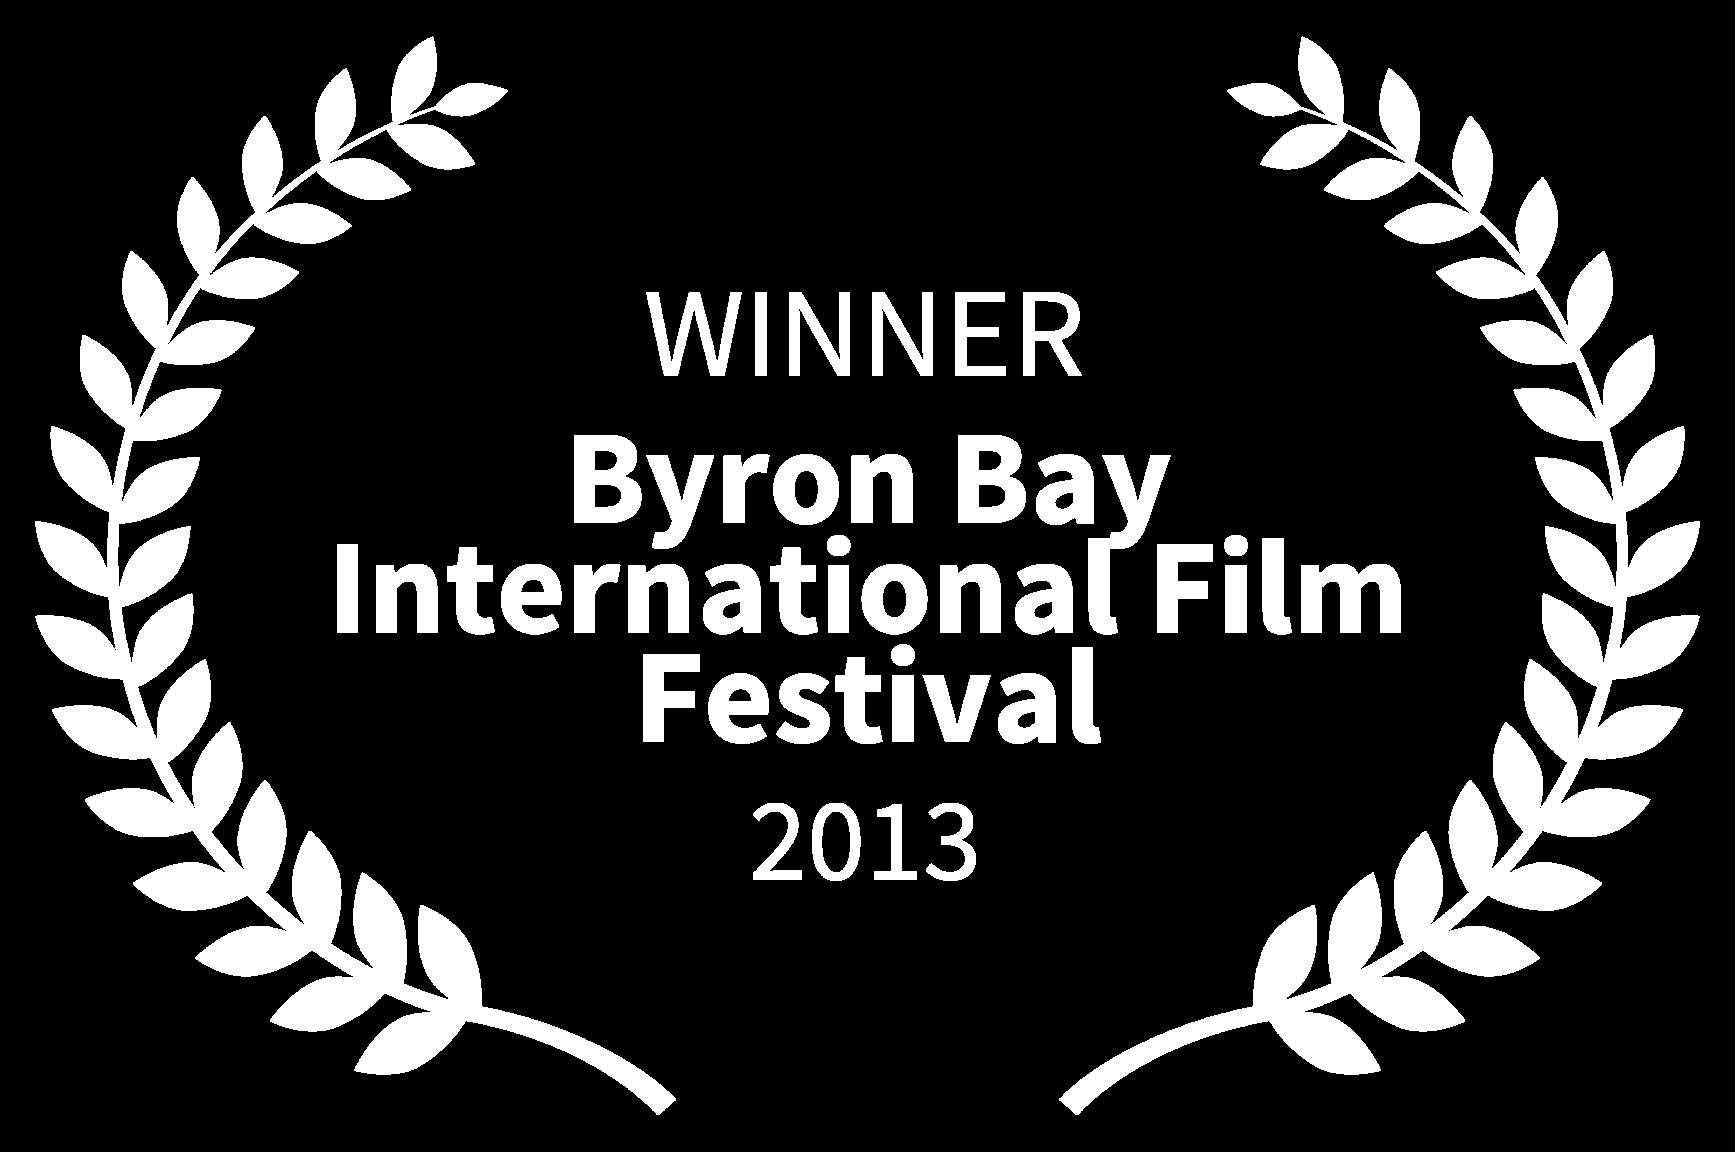 WINNER - Byron Bay International Film Festival - 2013.png